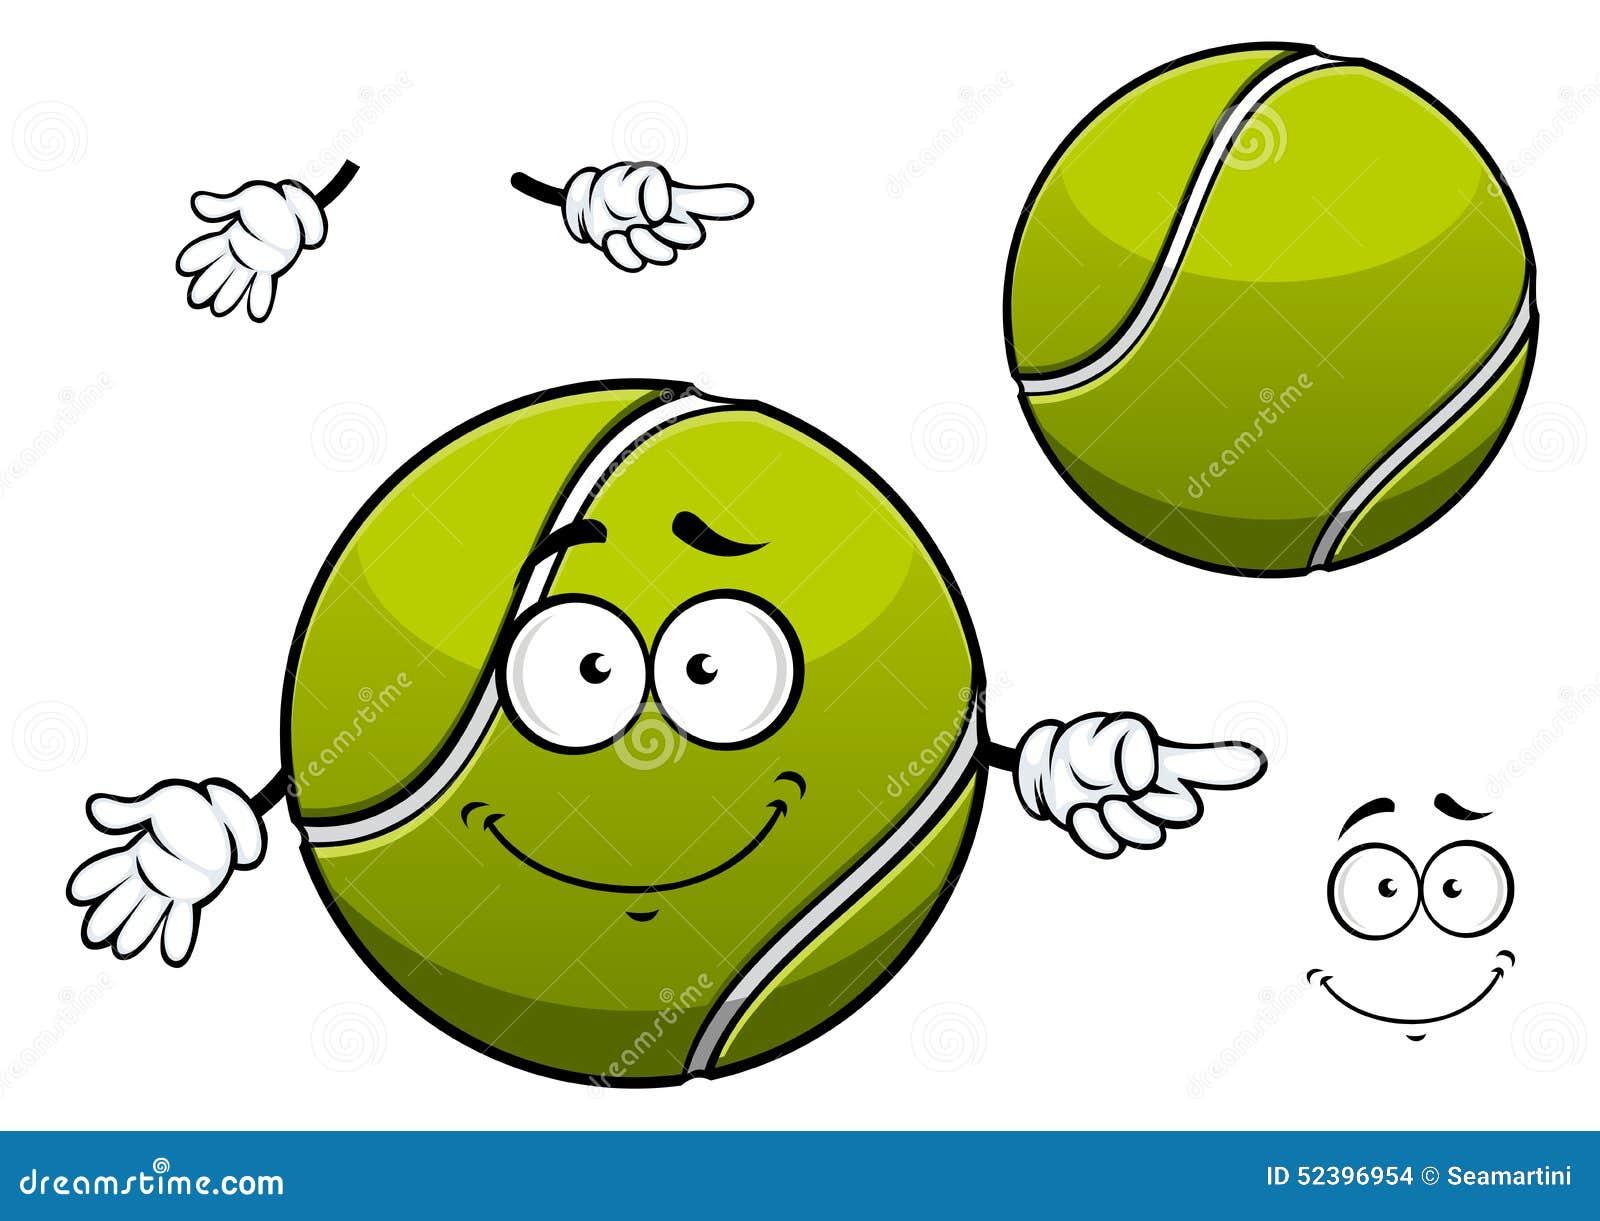 Tennis ball mascot stock photos tennis ball mascot stock photography - Cheerful Green Tennis Ball Cartoon Character Stock Images